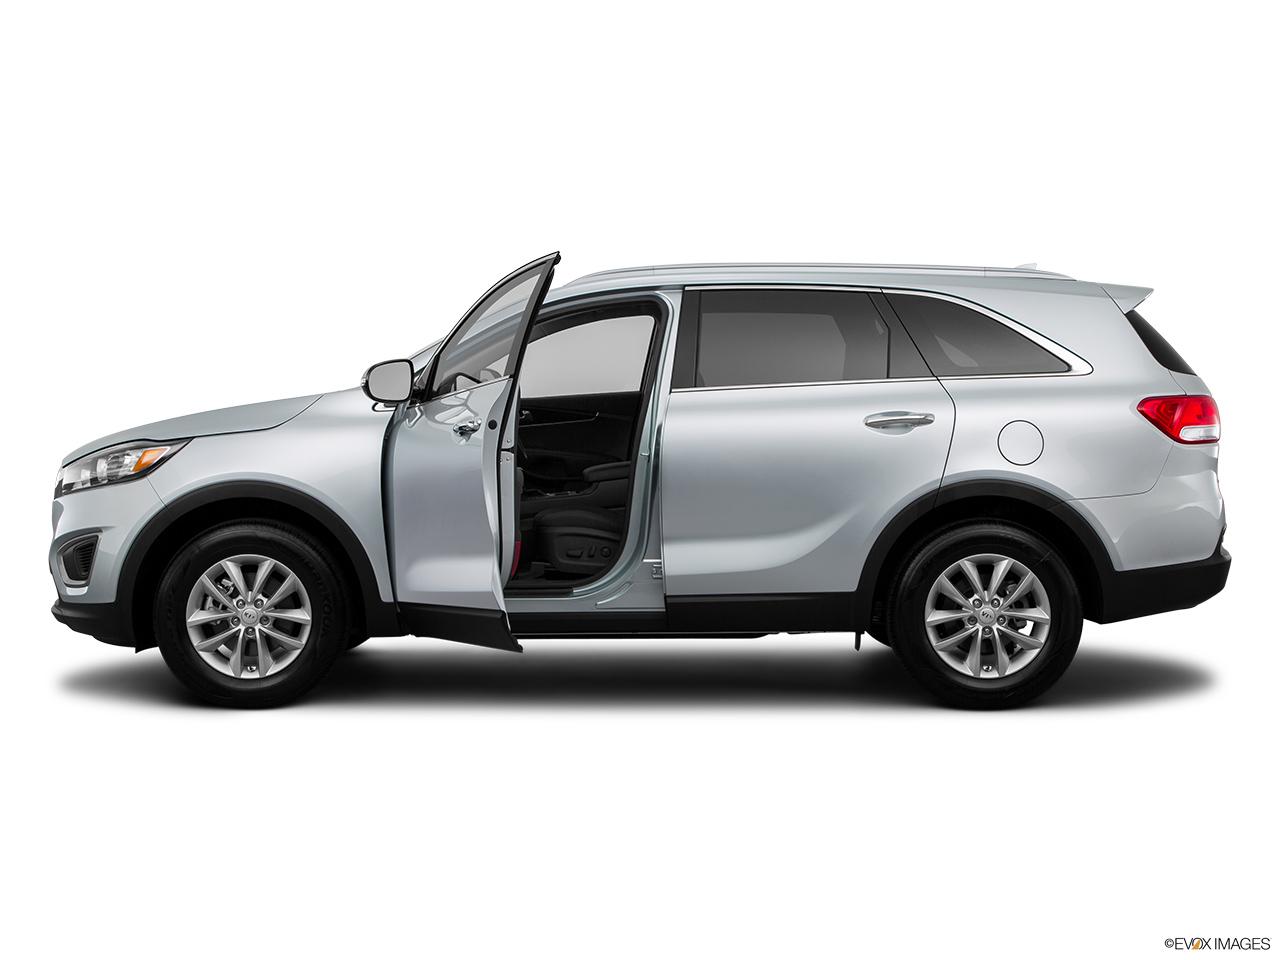 car features list for kia sorento 2016 2 4l base qatar yallamotor. Black Bedroom Furniture Sets. Home Design Ideas